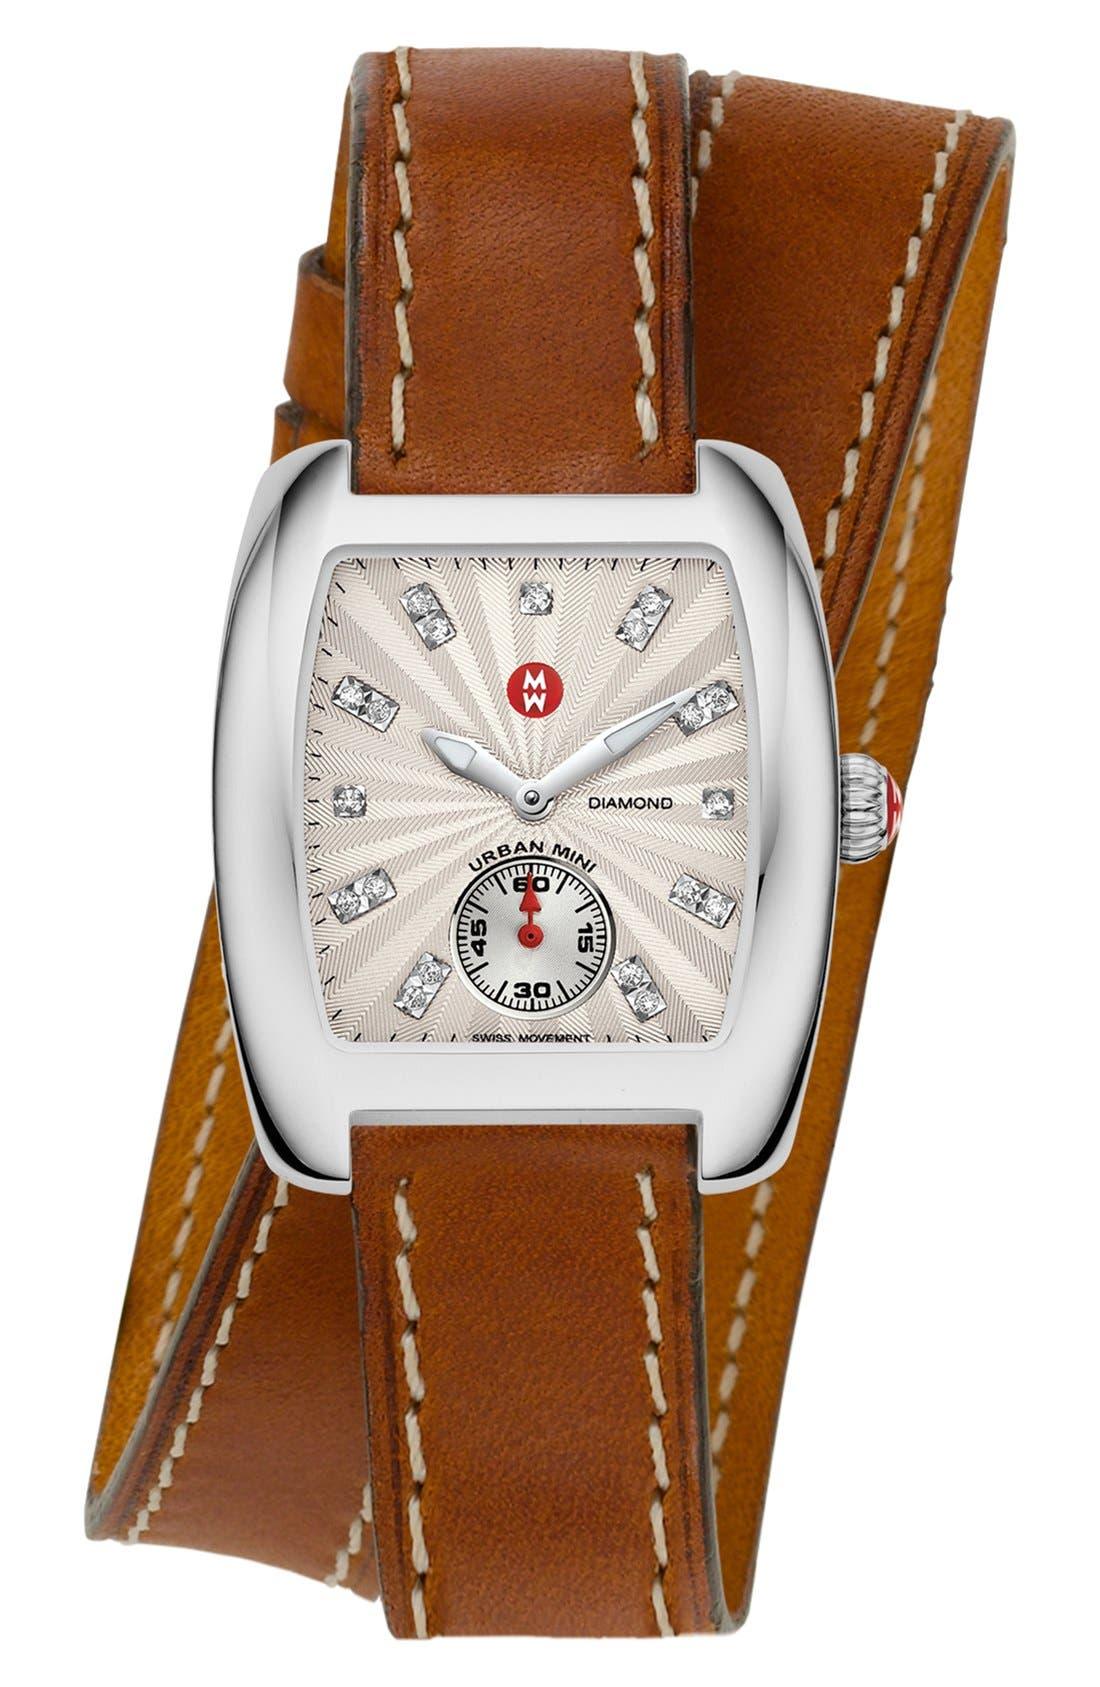 Urban Mini Diamond Dial Watch Case, 29mm x 30mm,                             Alternate thumbnail 6, color,                             040